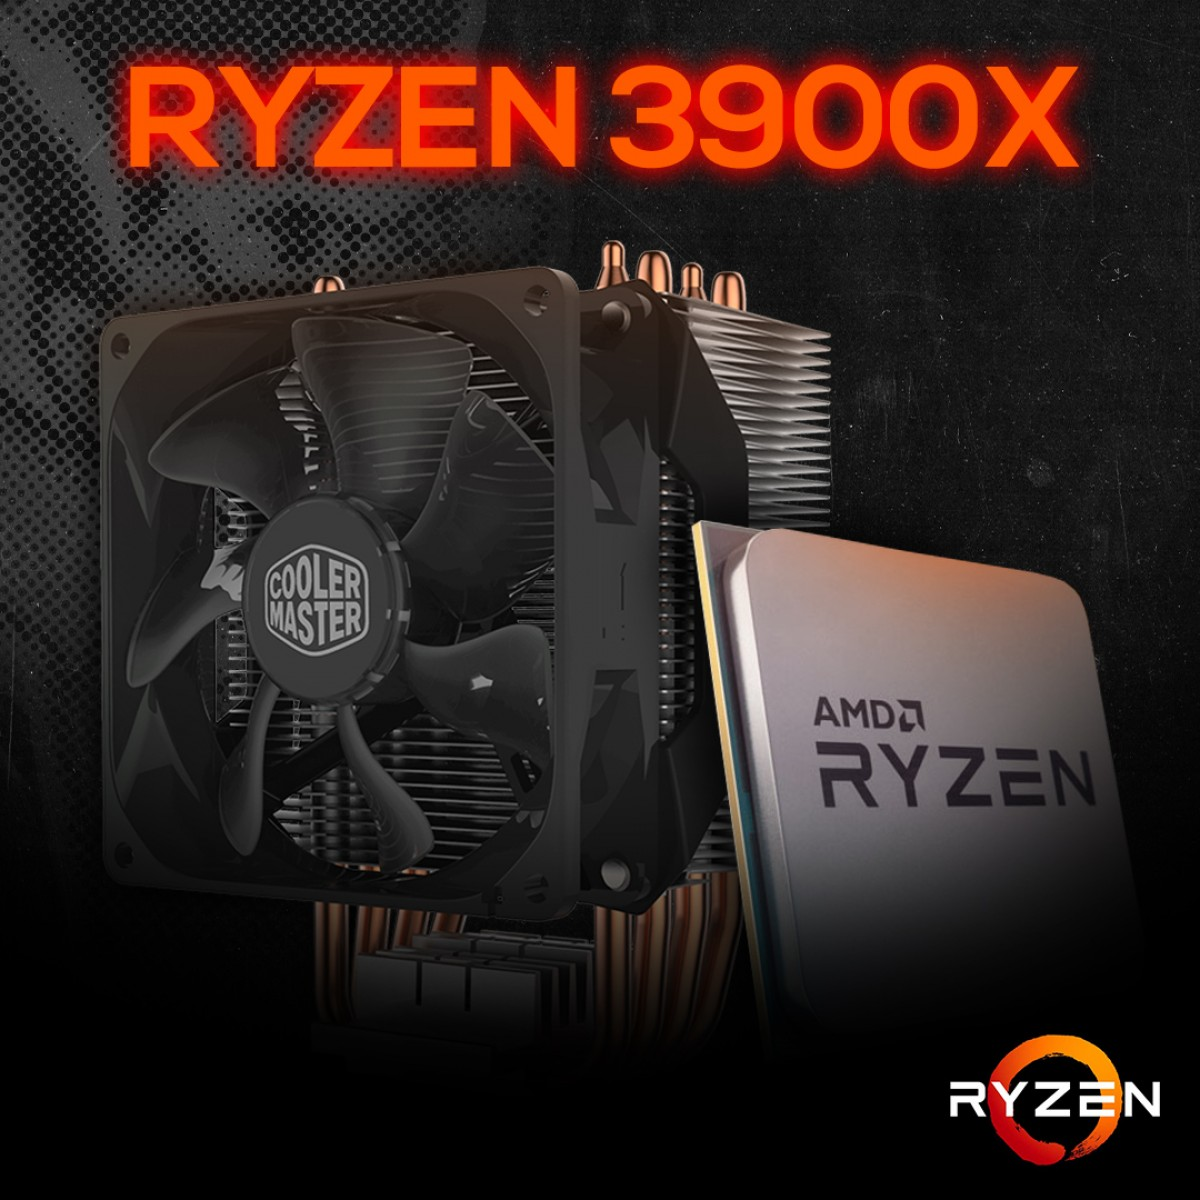 Processador AMD Ryzen 9 3900x 3.8ghz (4.6ghz Turbo), 12-cores 24-threads, + COOLER MASTER HYPER H412R